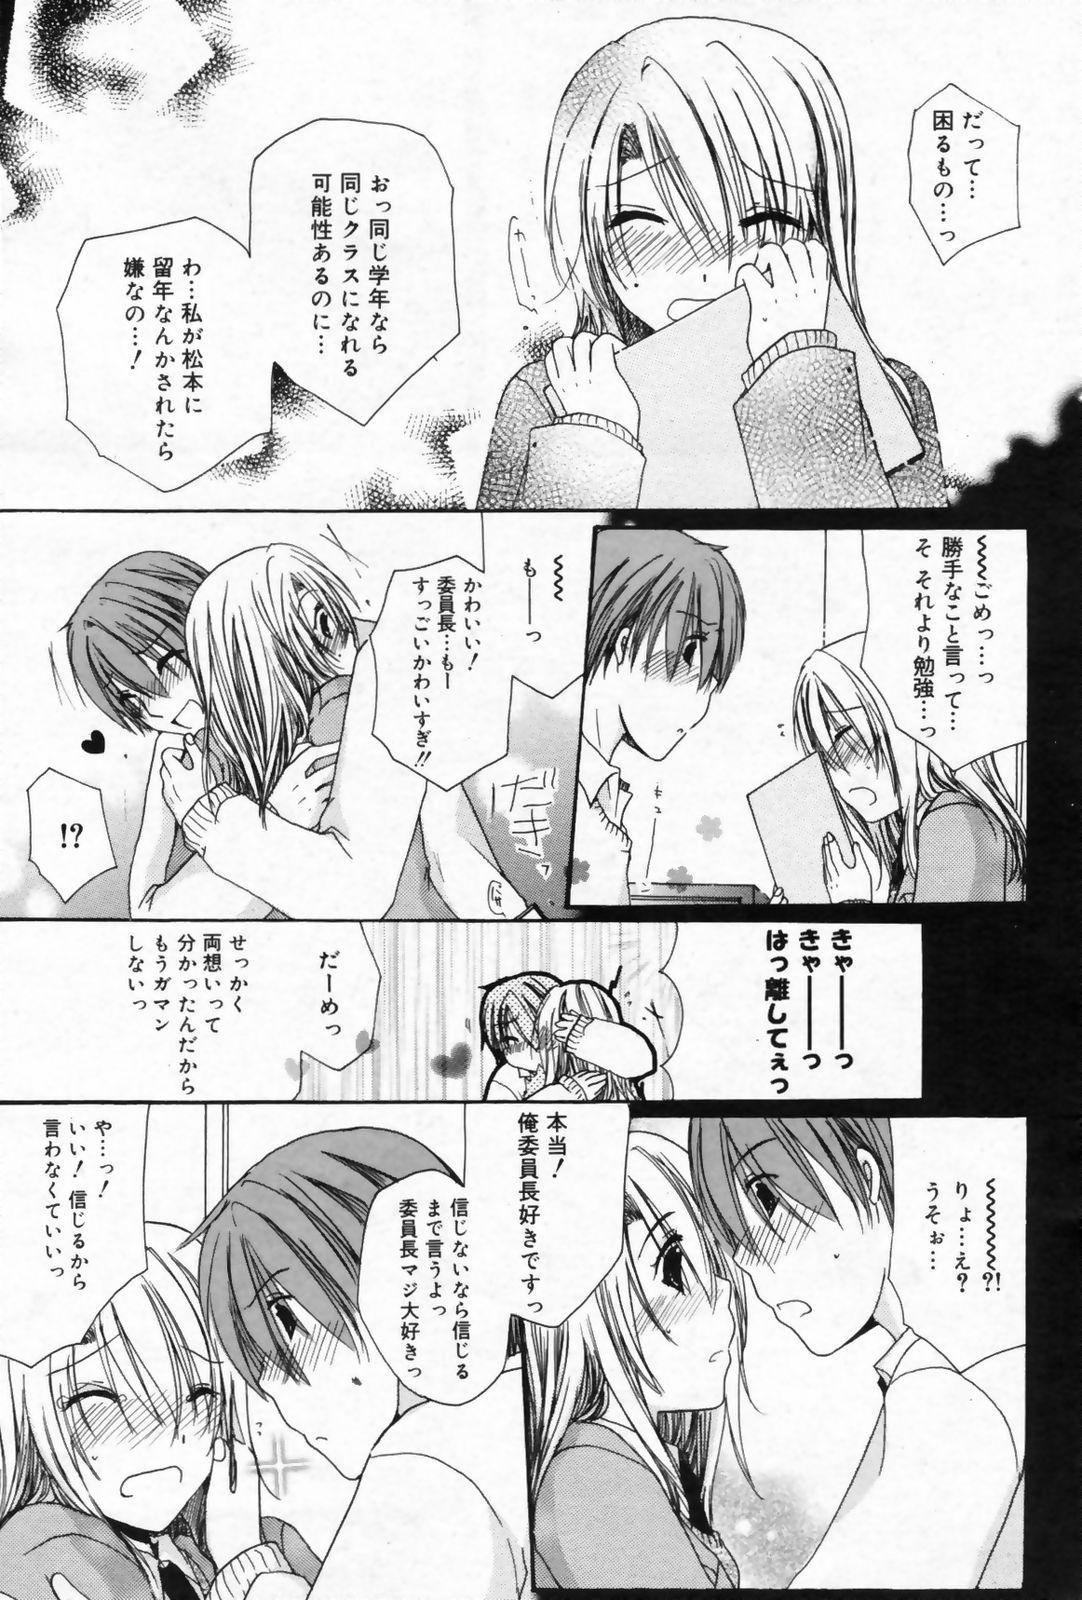 Manga Bangaichi 2009-02 Vol. 234 104